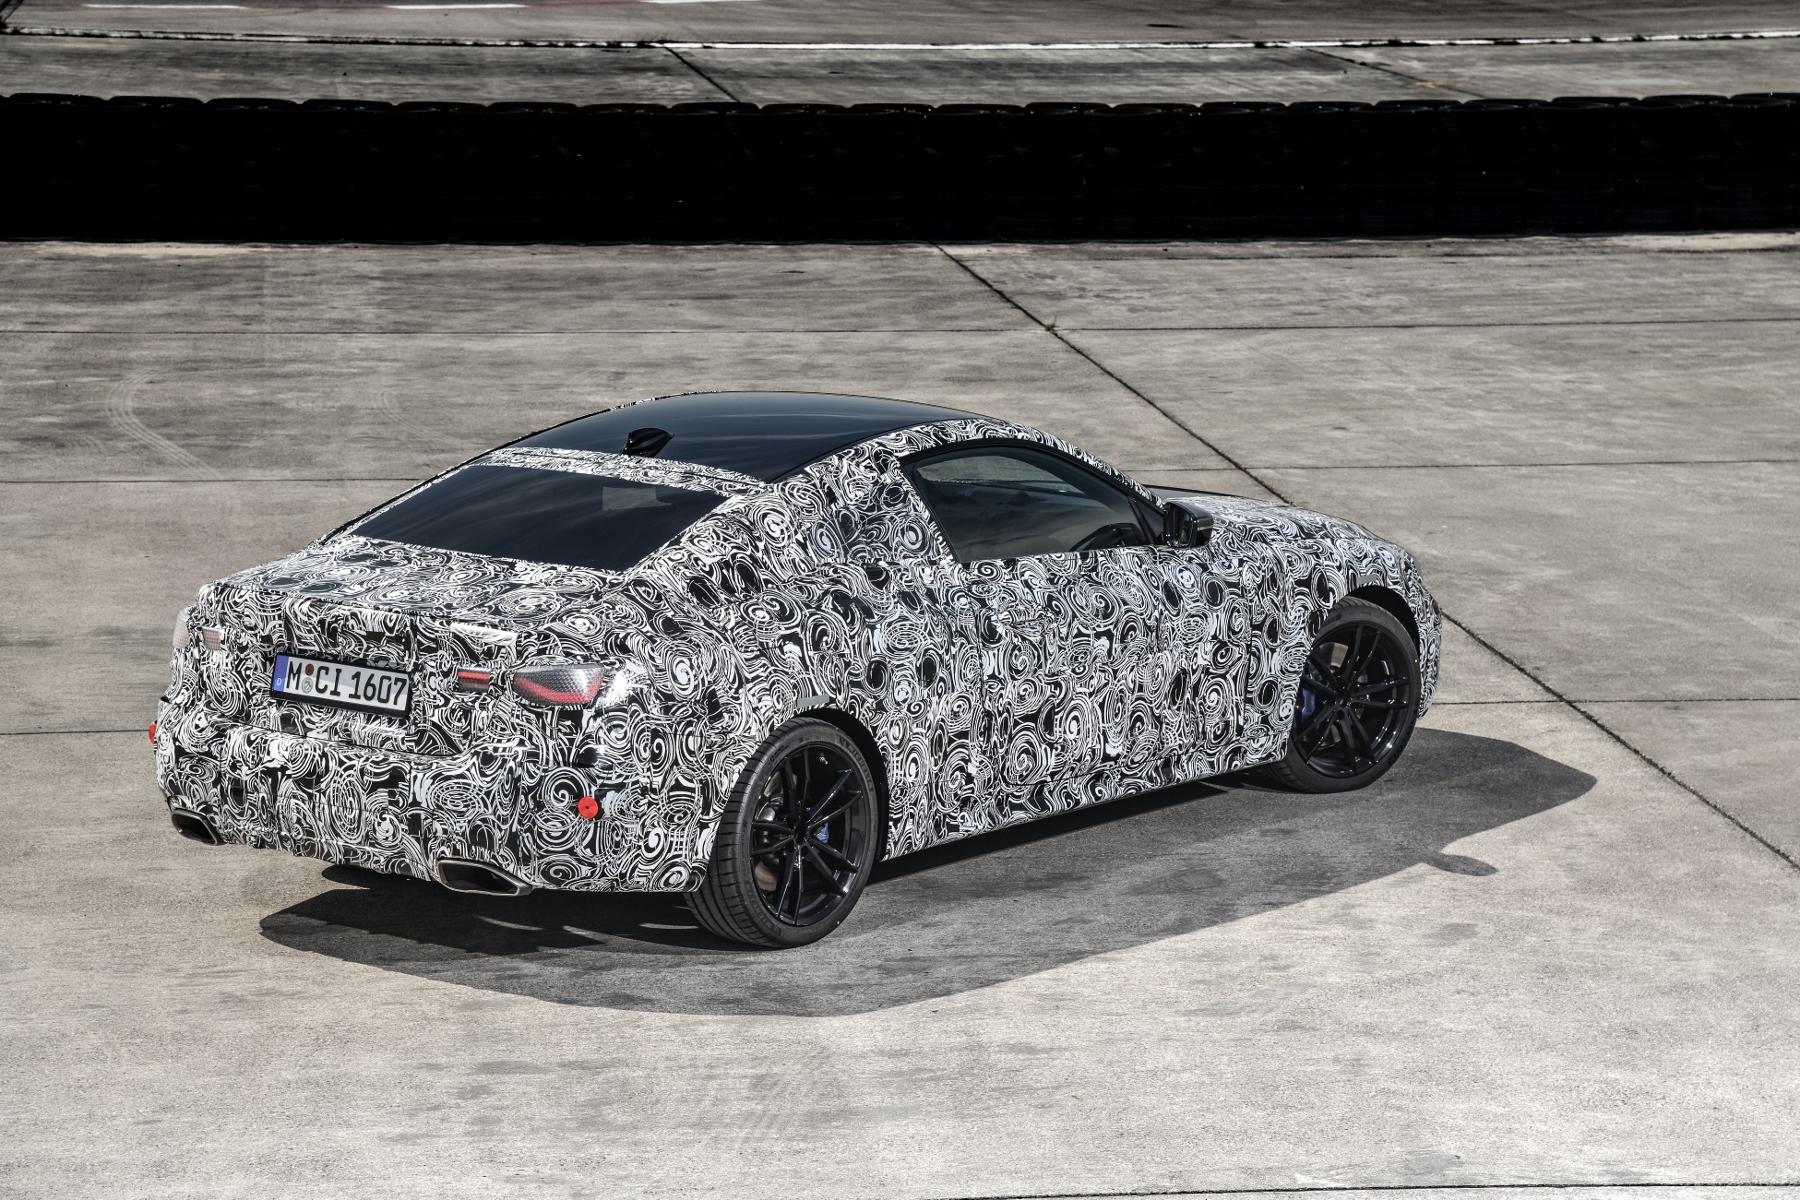 Nové BMW radu 4 Coupé dostane športovejší podvozok KoKlXCnIXm bmw-4-coupe-21